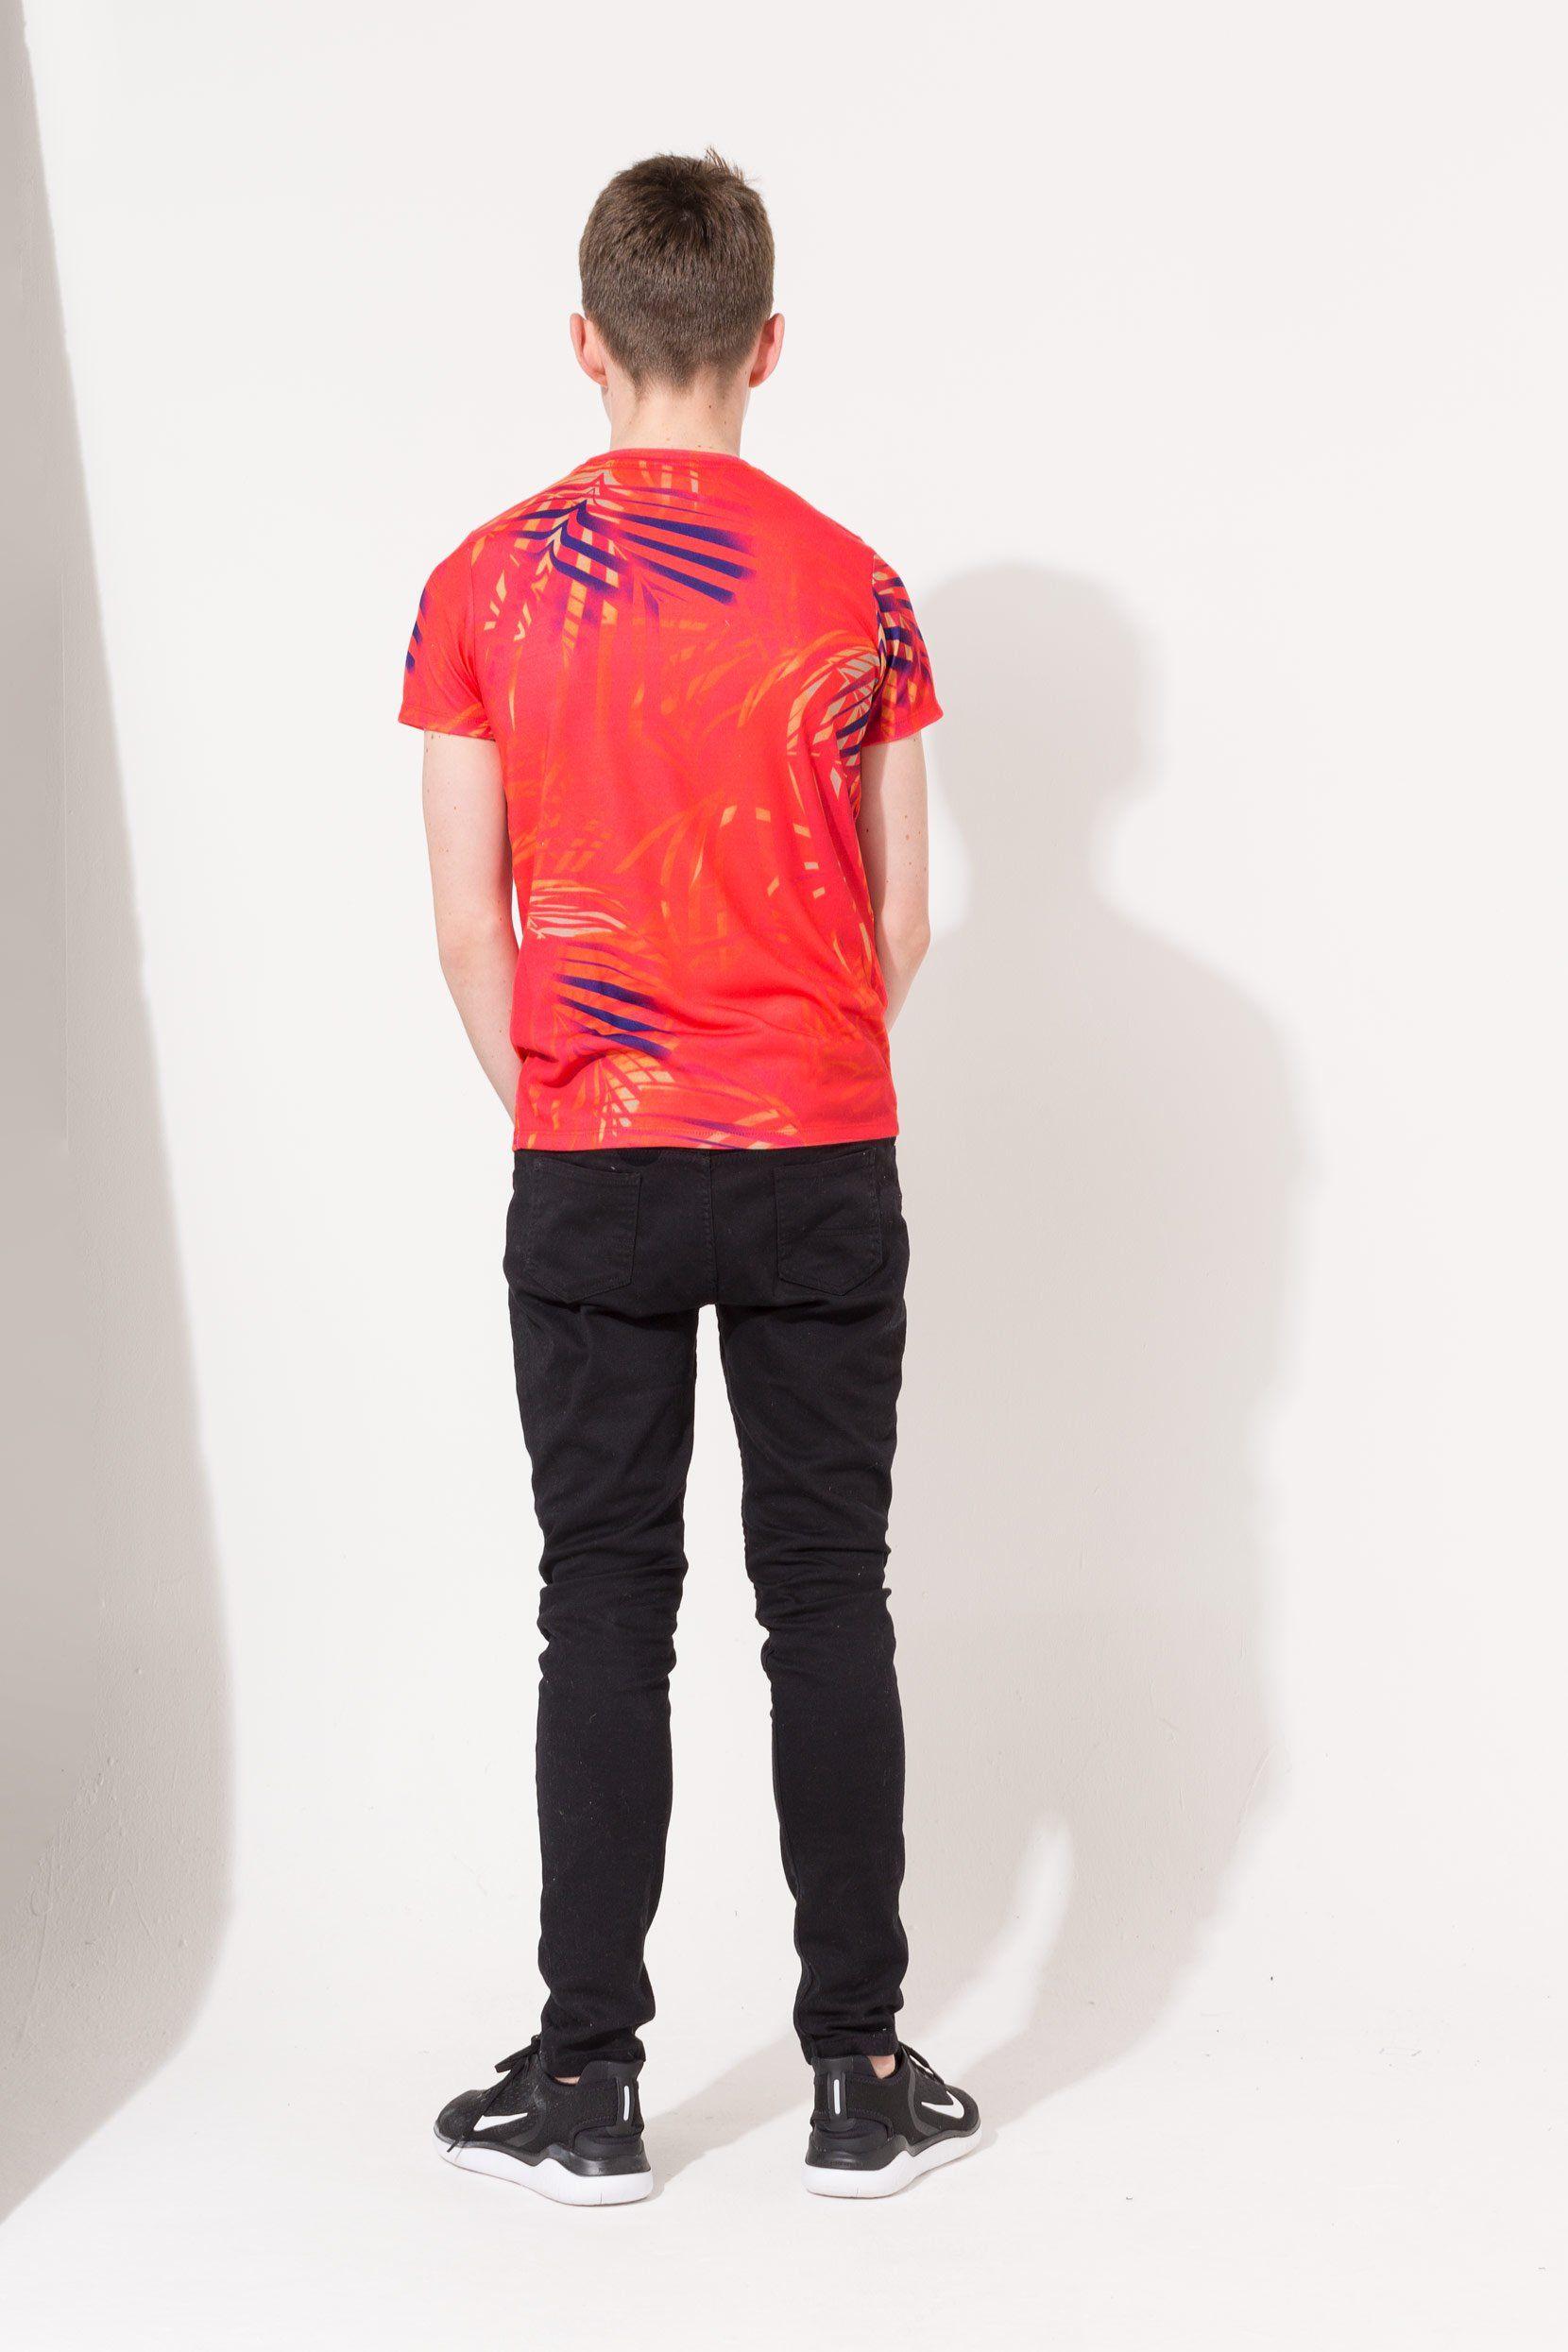 Hype Red Palm Crest Kids T-Shirt